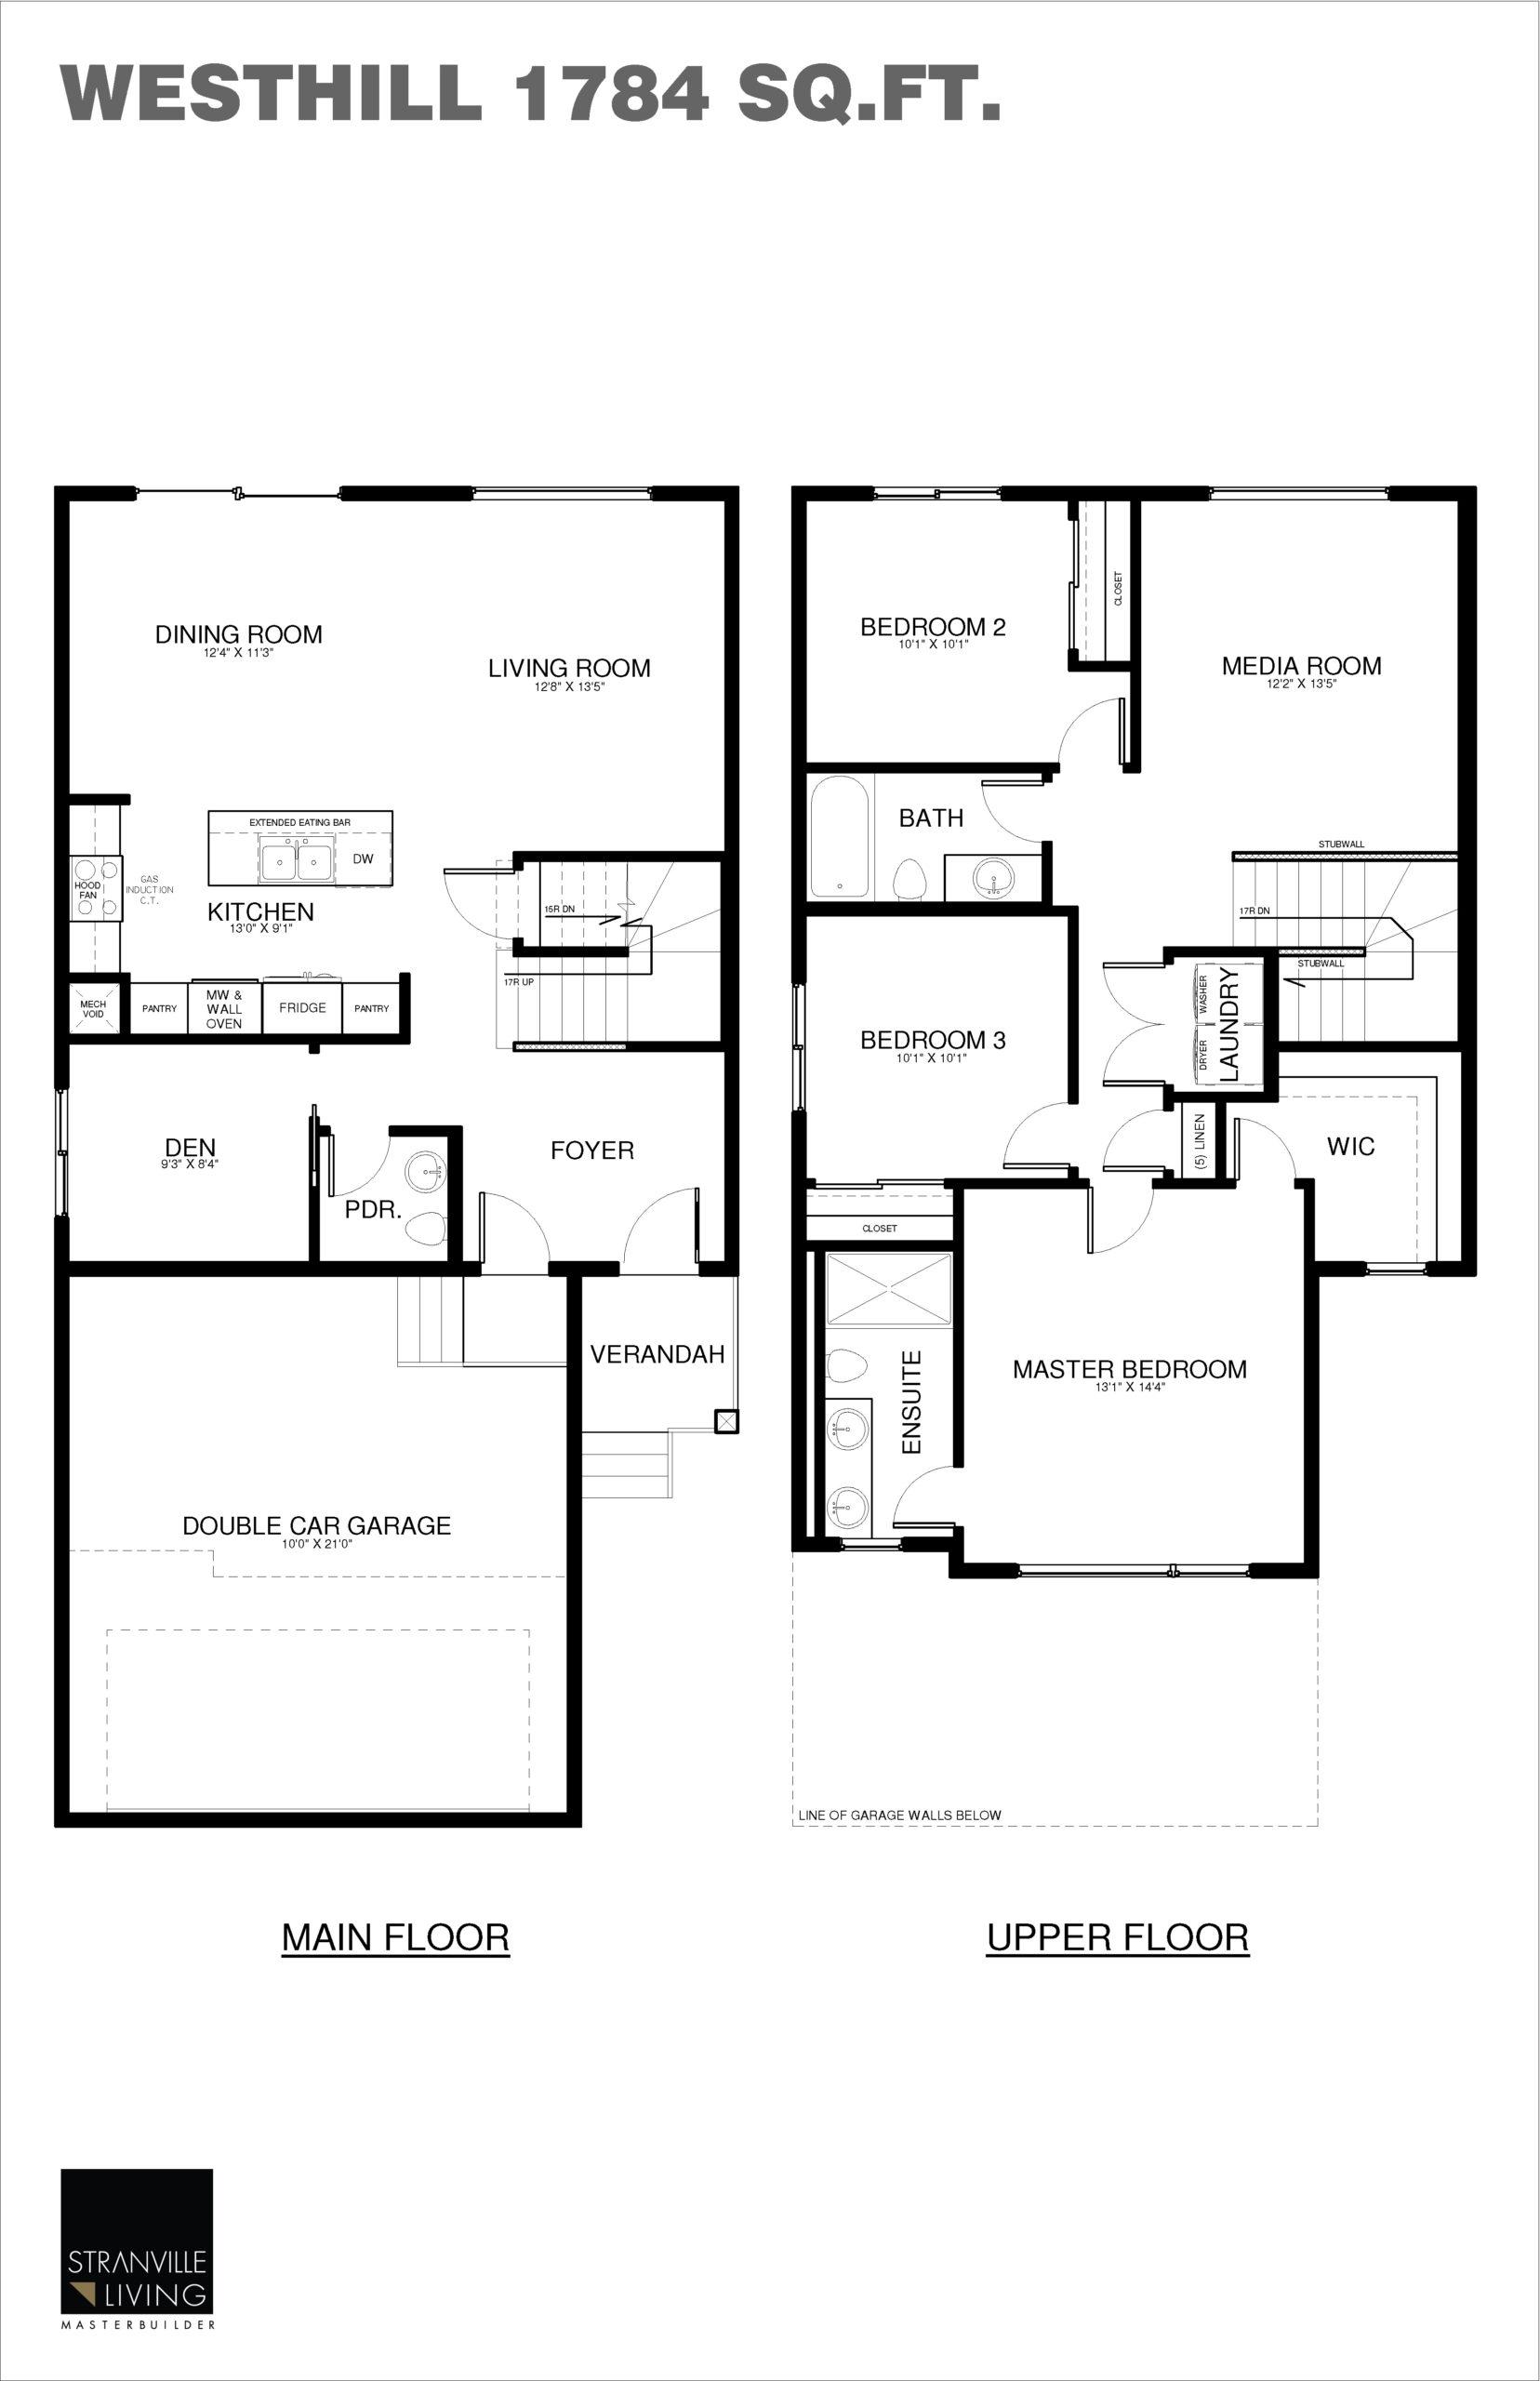 New Home For Sale Lethbridge